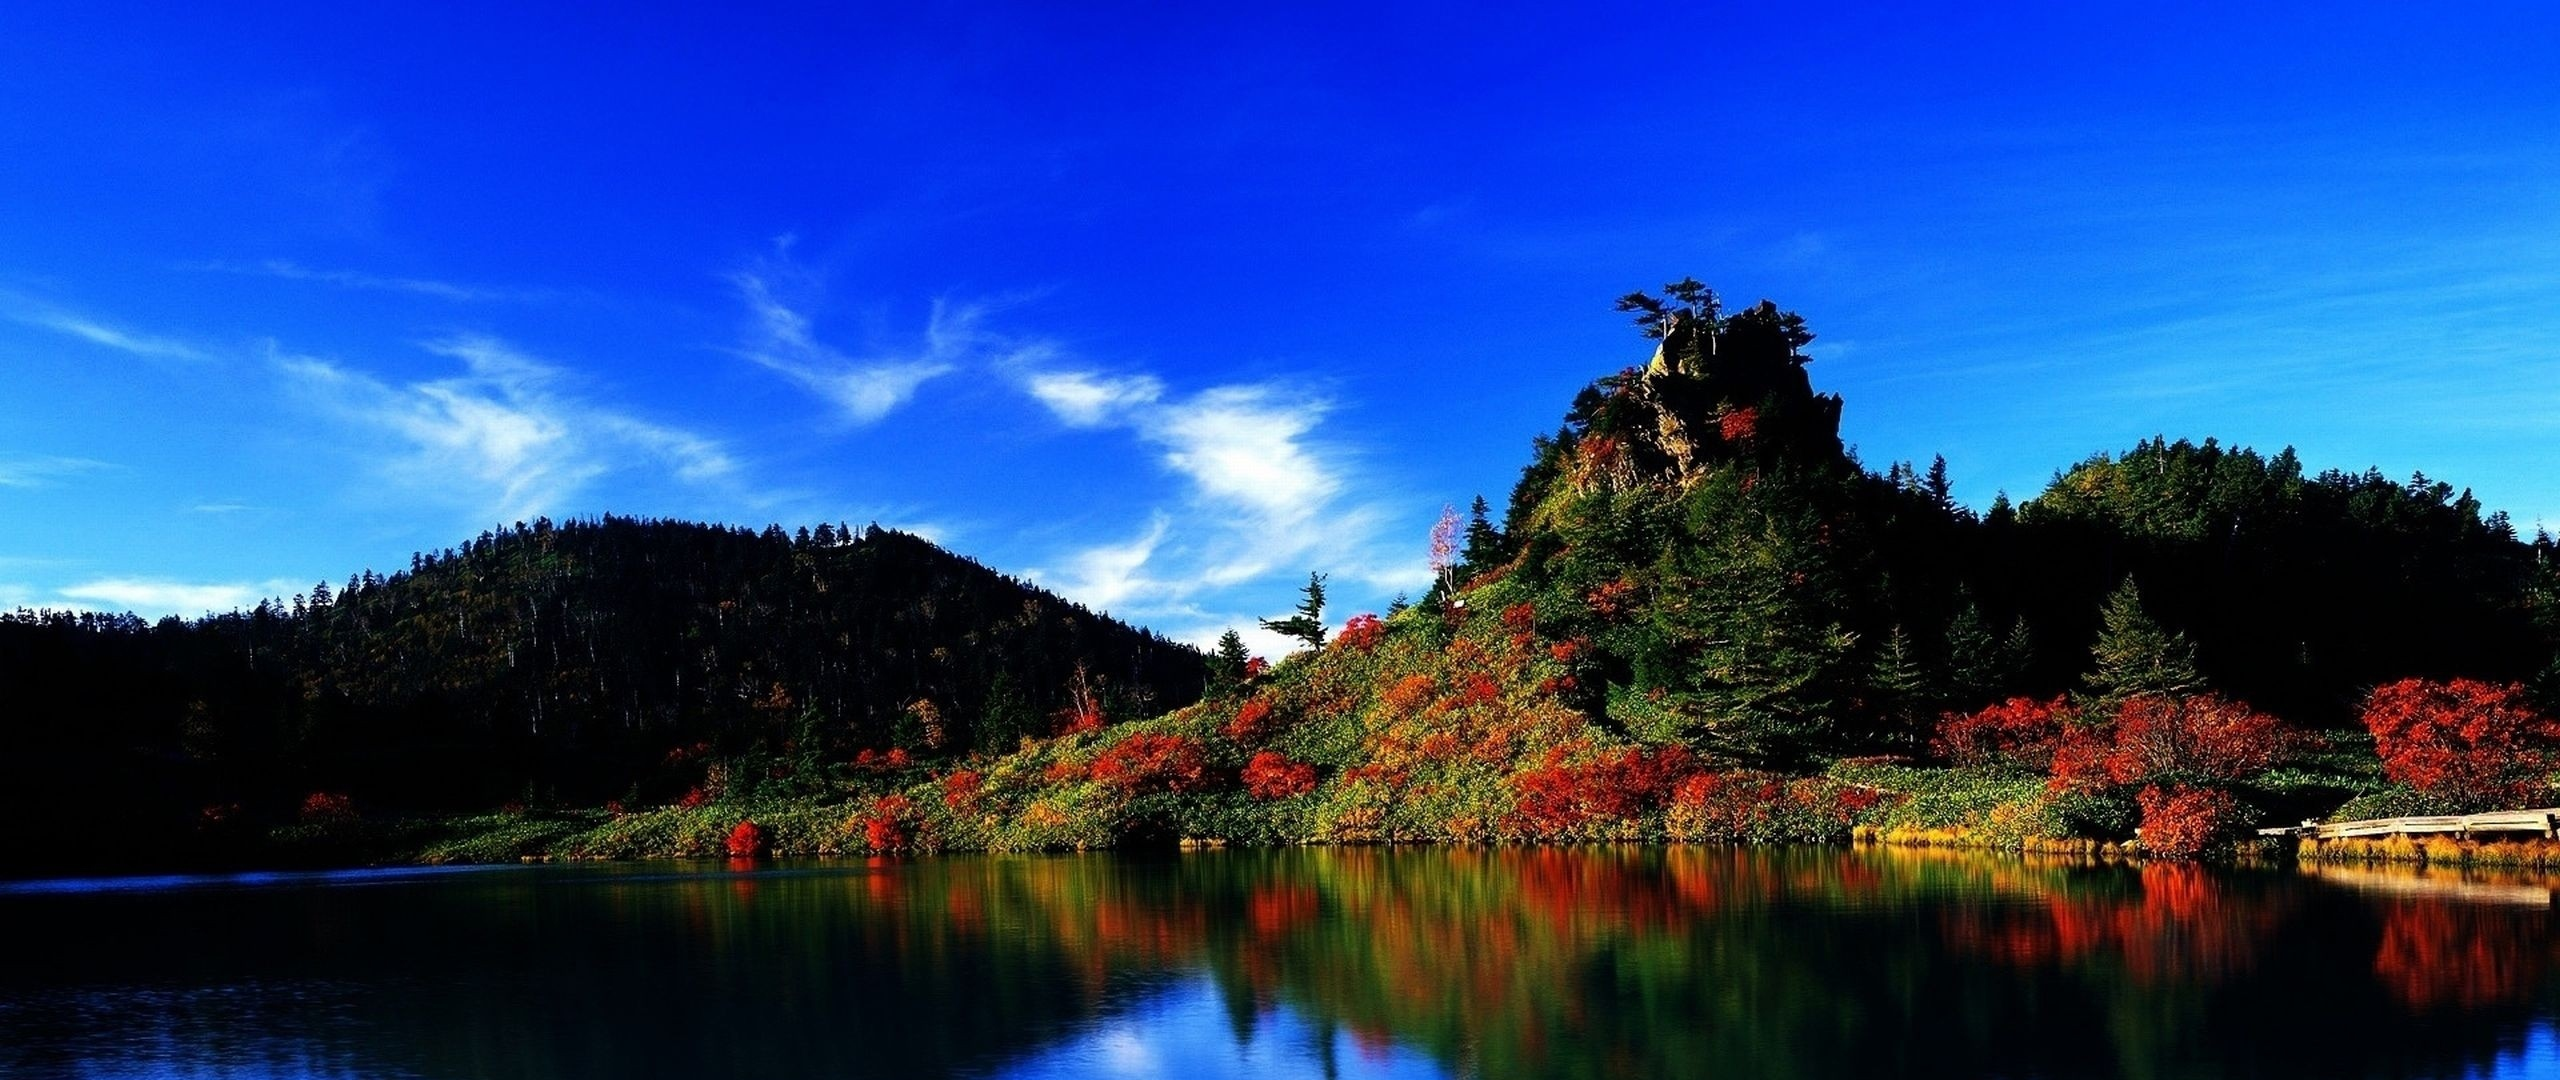 Japan Sky Beautiful Scenery Wallpaper Background 2560x1080 219 TV 2560x1080